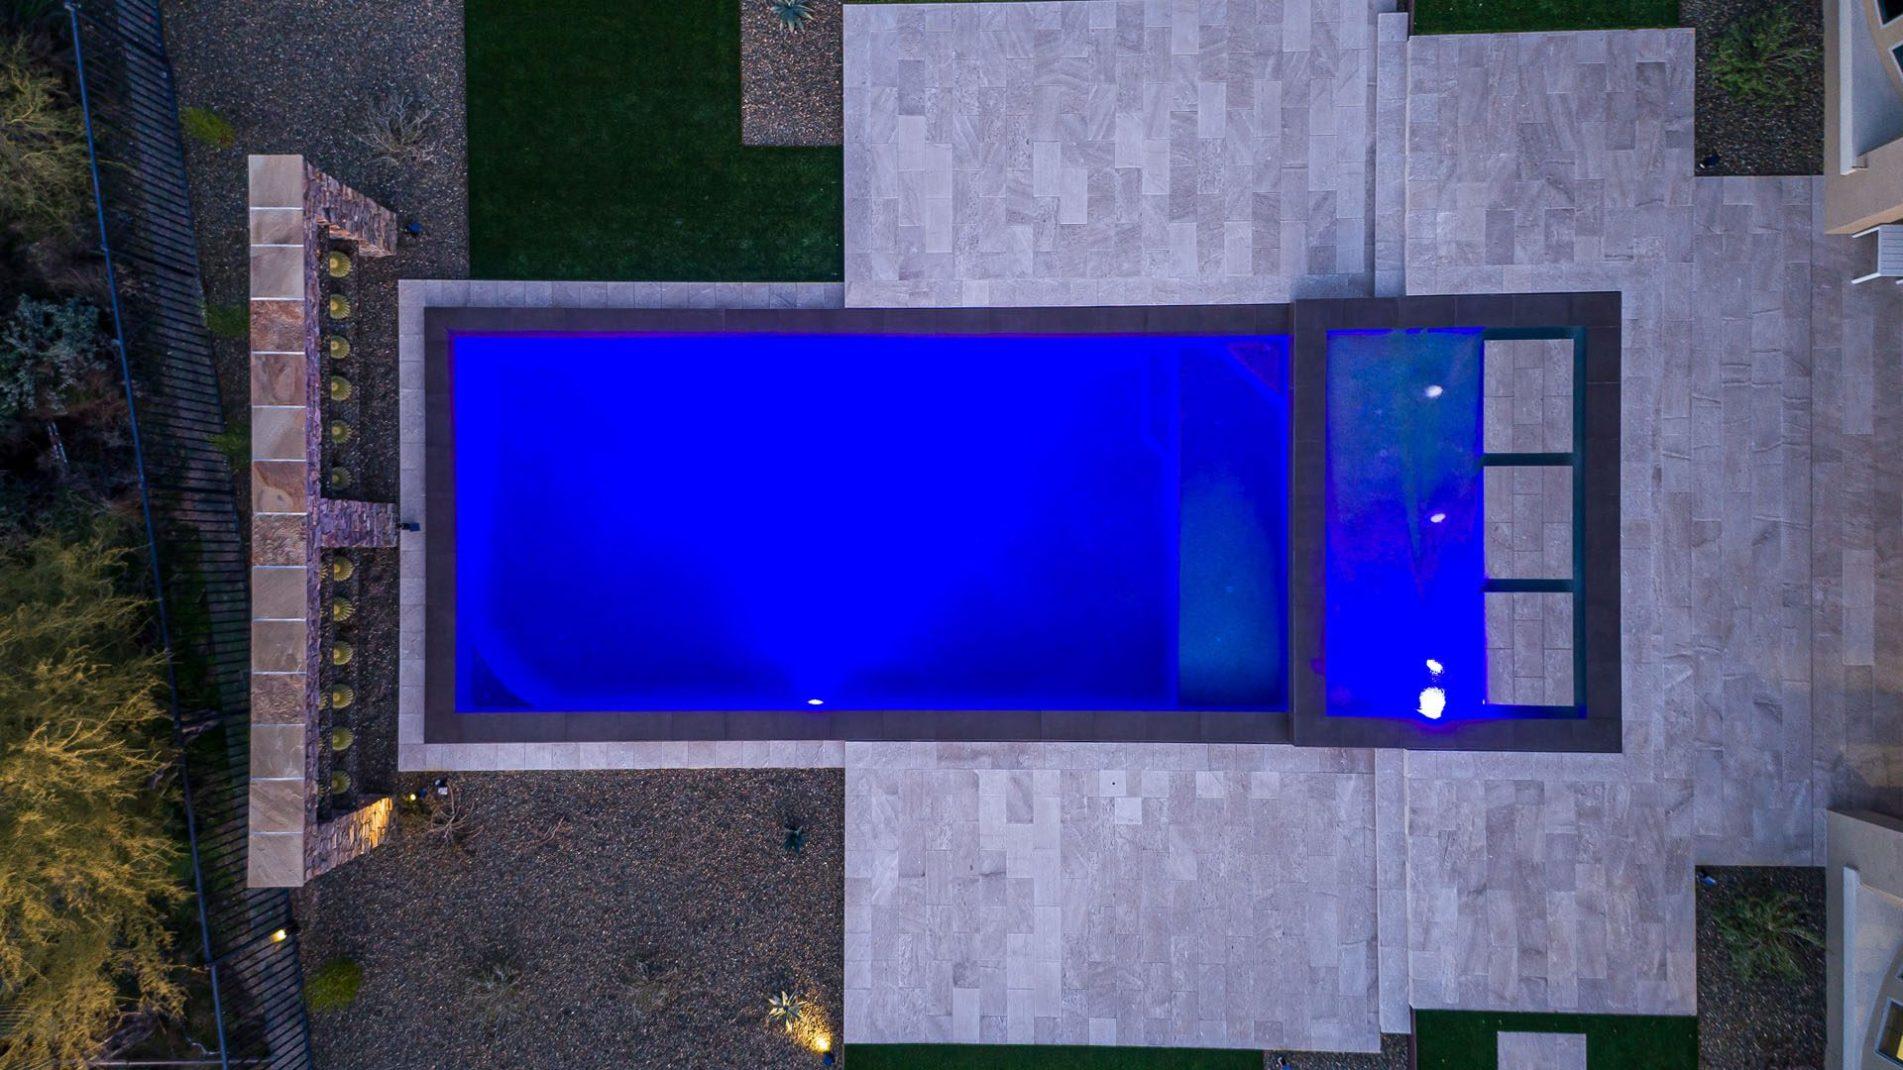 Modern Geometric Swimming Pool Art In Cave Creek Drone View